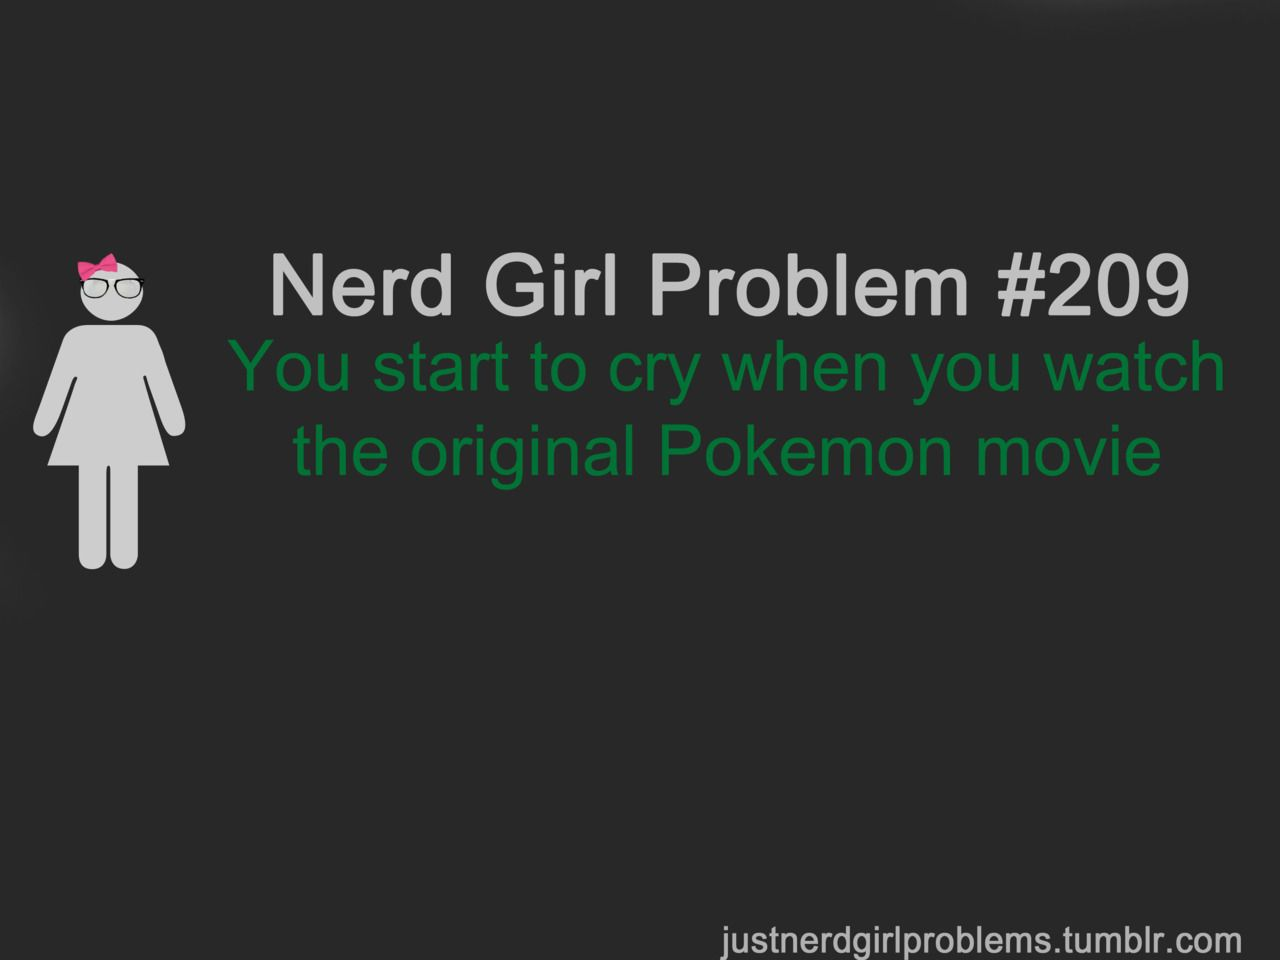 Nerd Girl Problem #209 The original Pokemon movie